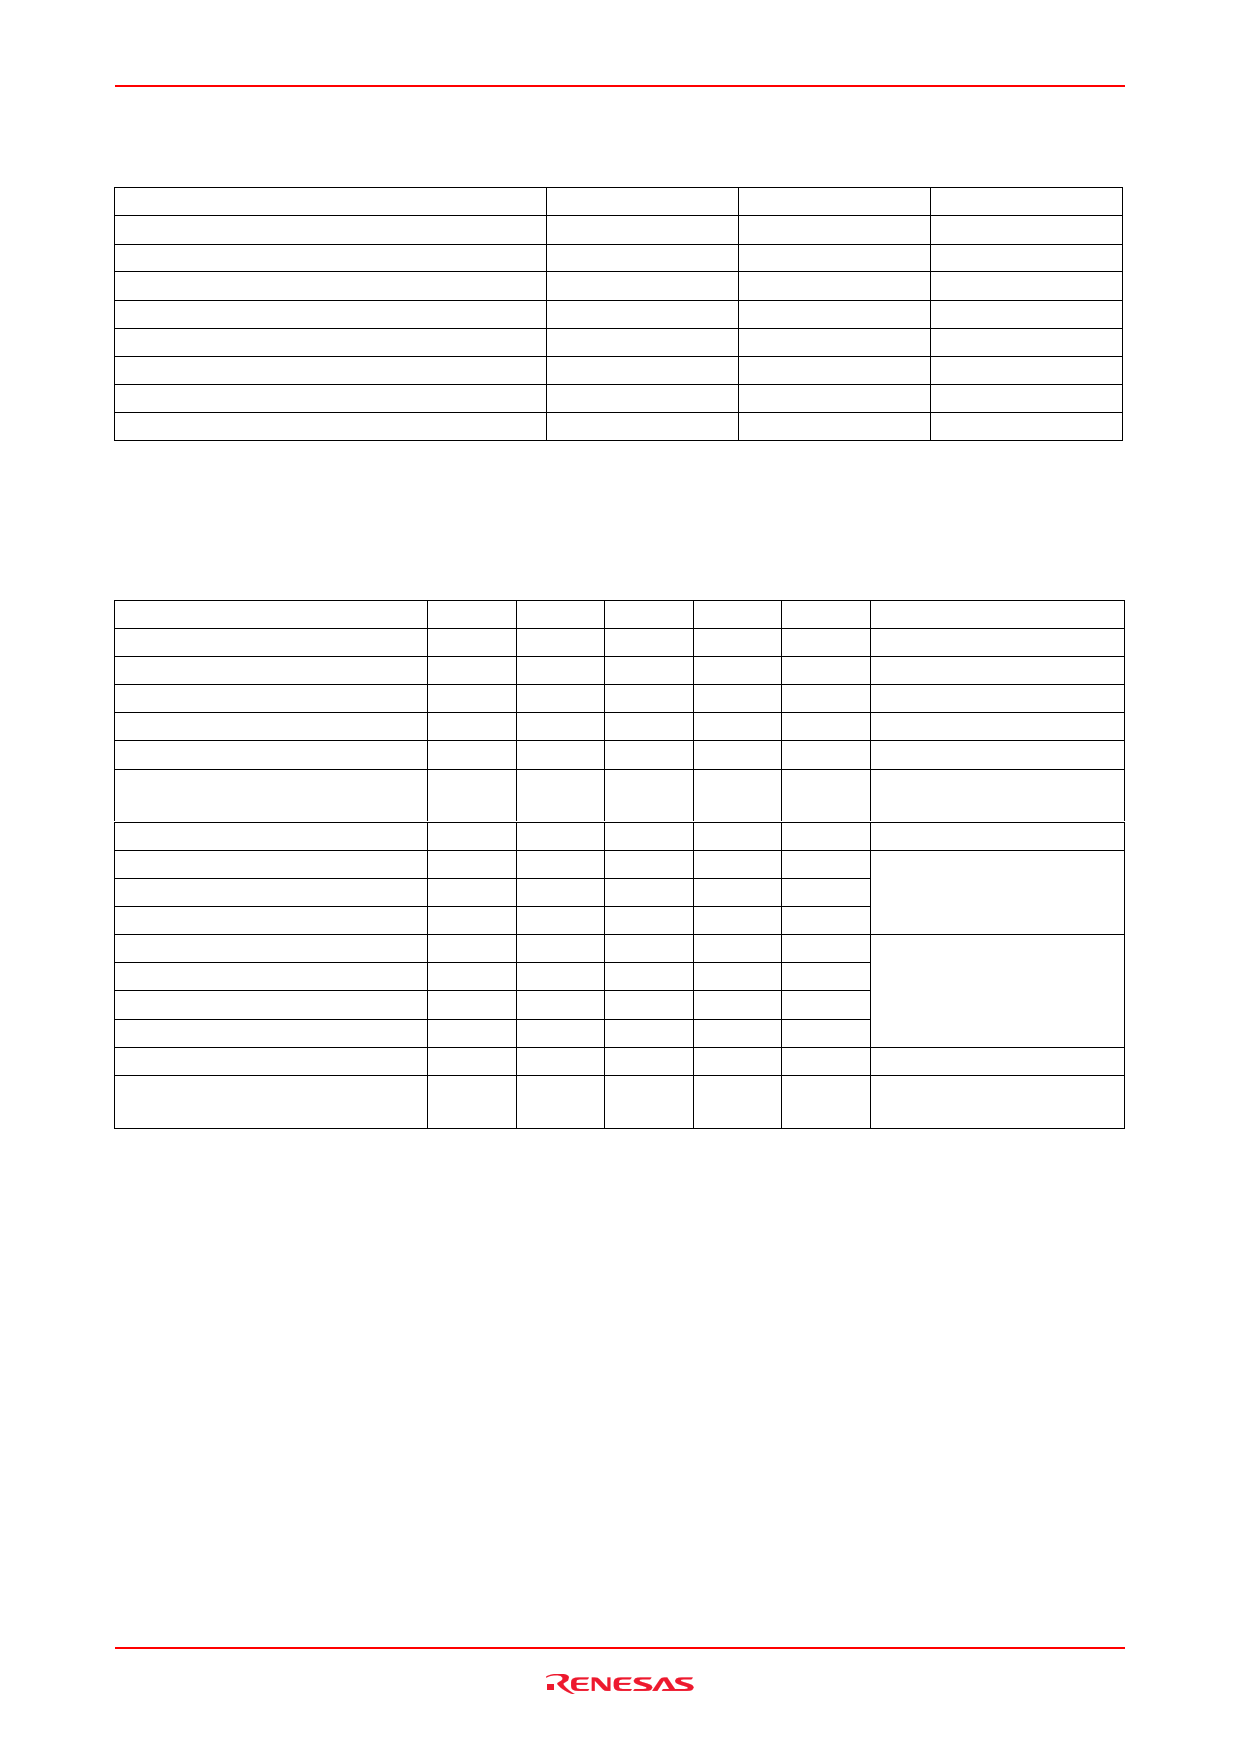 2SK1948 pdf, schematic